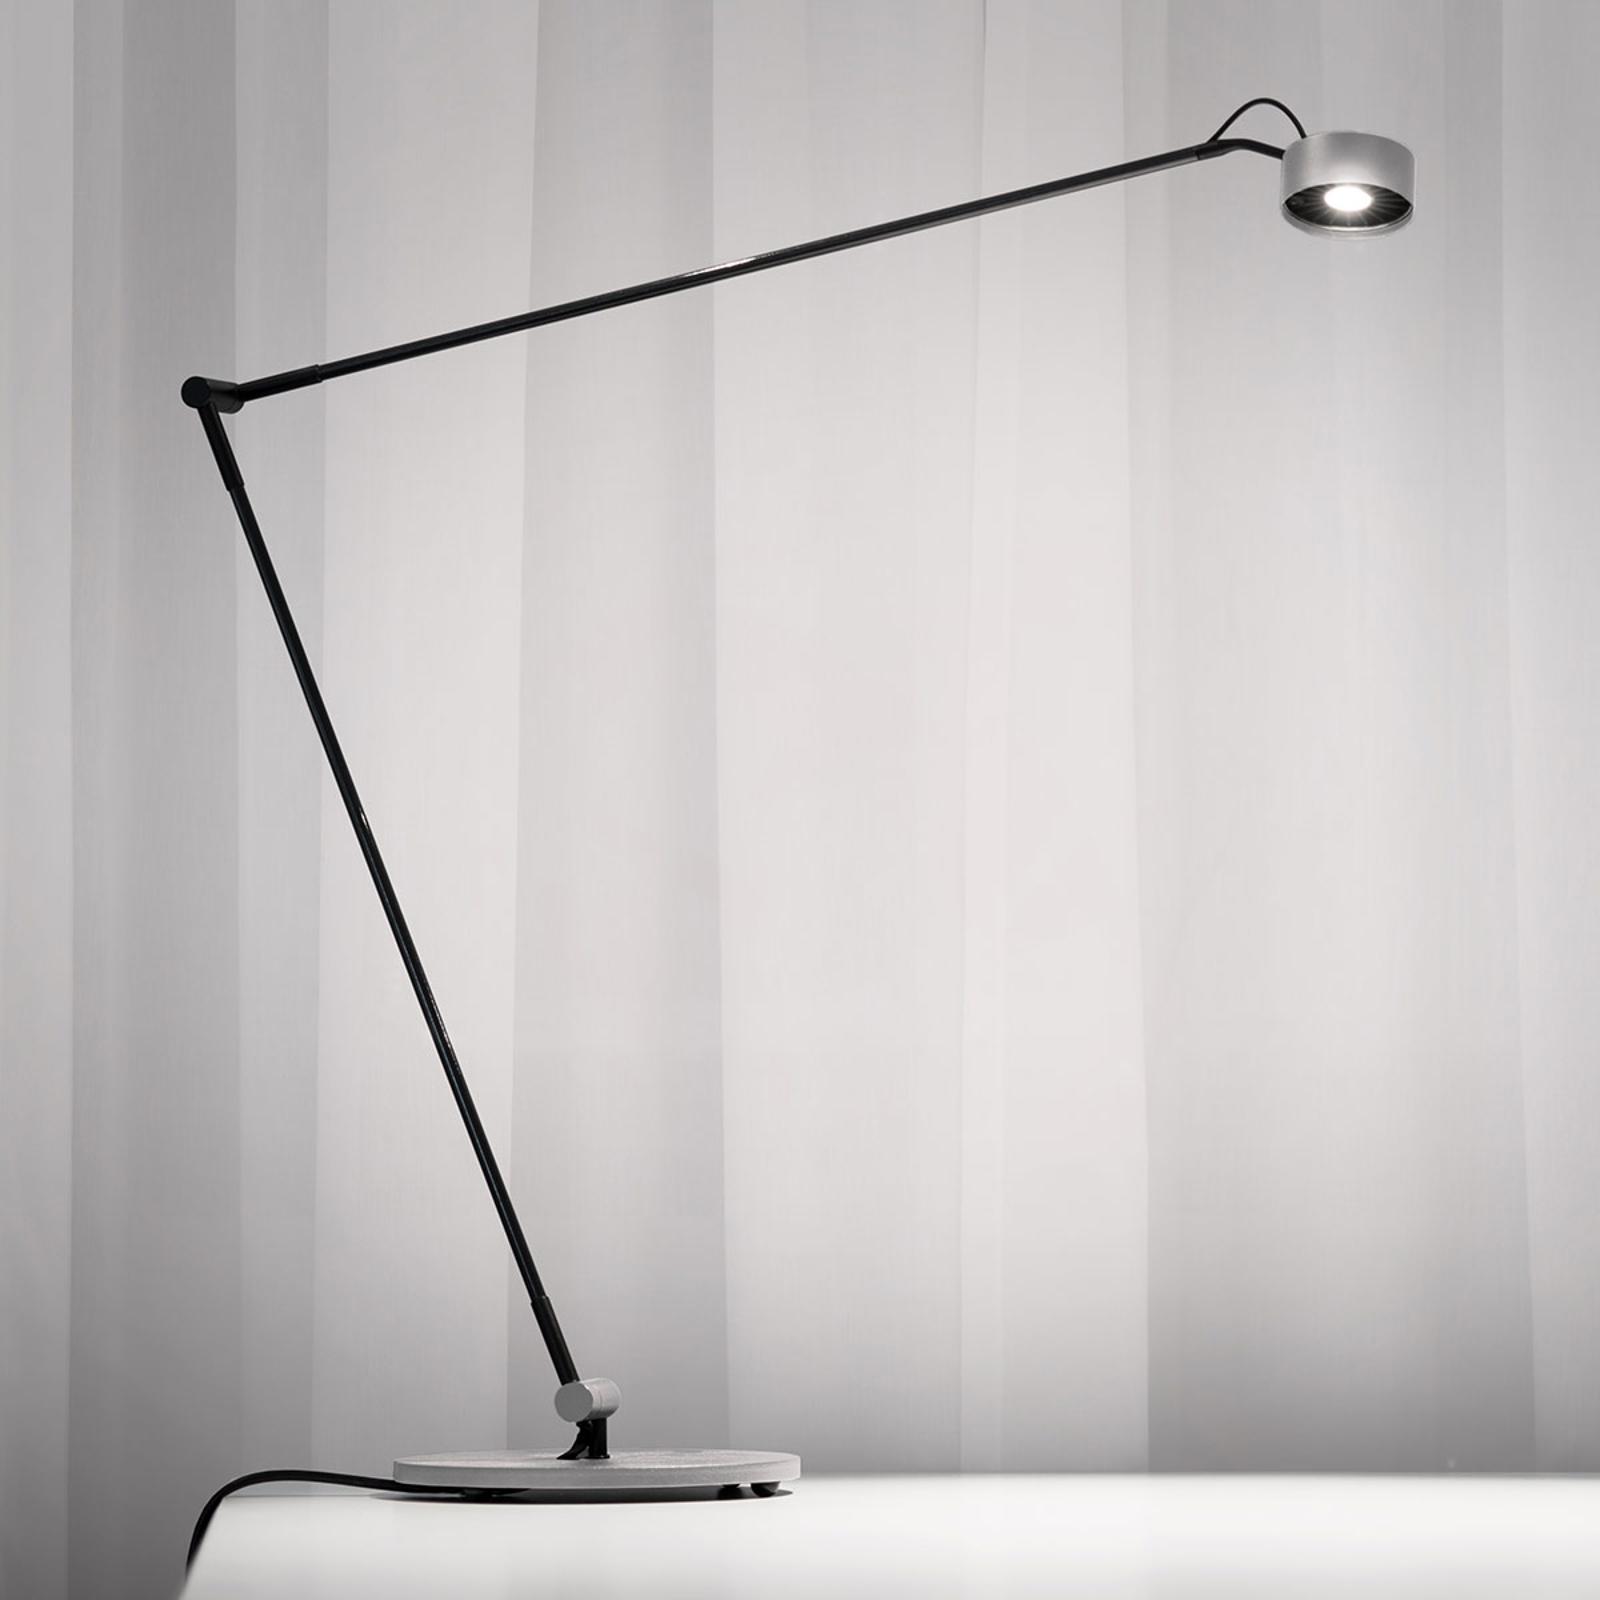 LED tafellamp Basica 930 E met dwarsarm, zilver